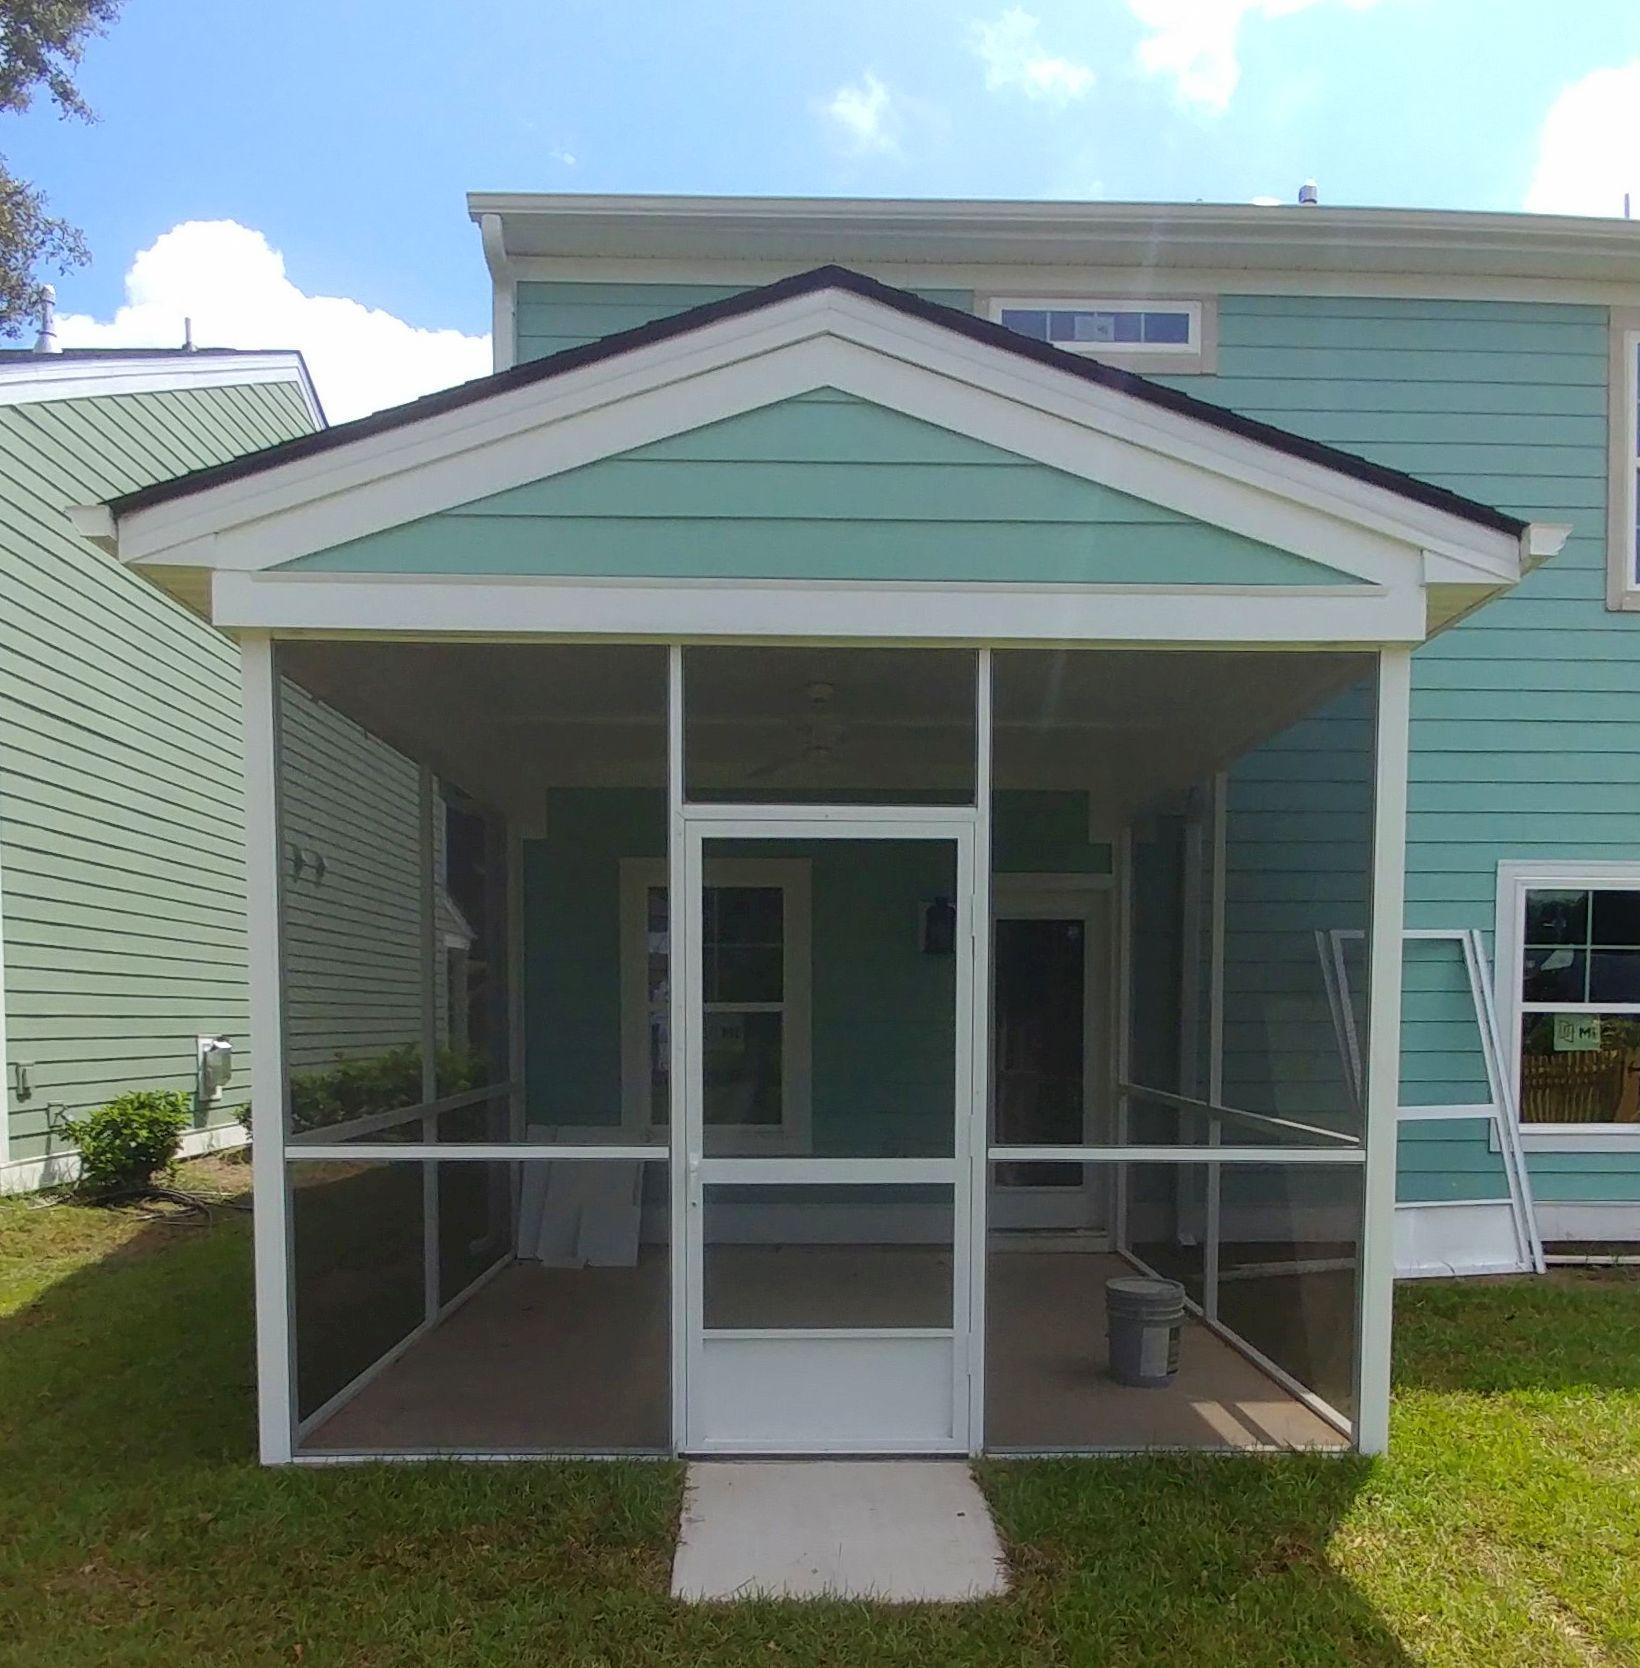 Photo of 5471 Turner St, North Charleston, SC 29406